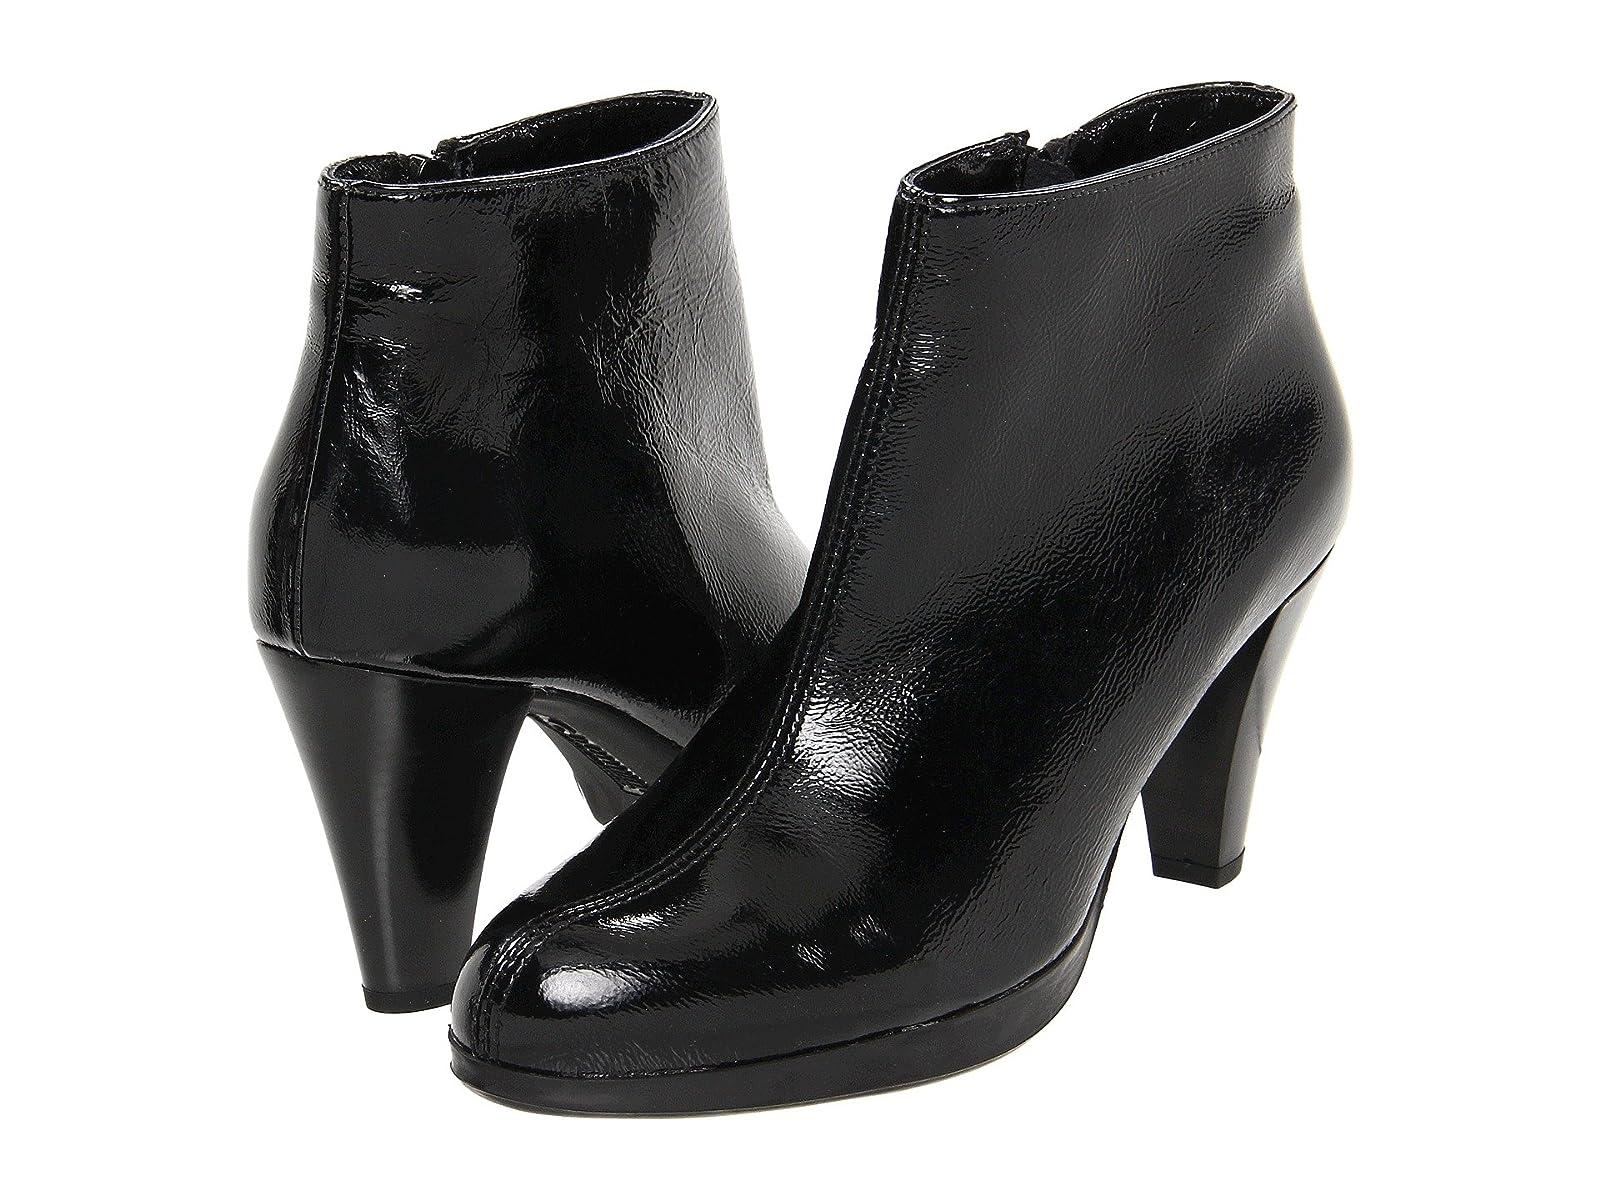 La Canadienne MeganCheap and distinctive eye-catching shoes